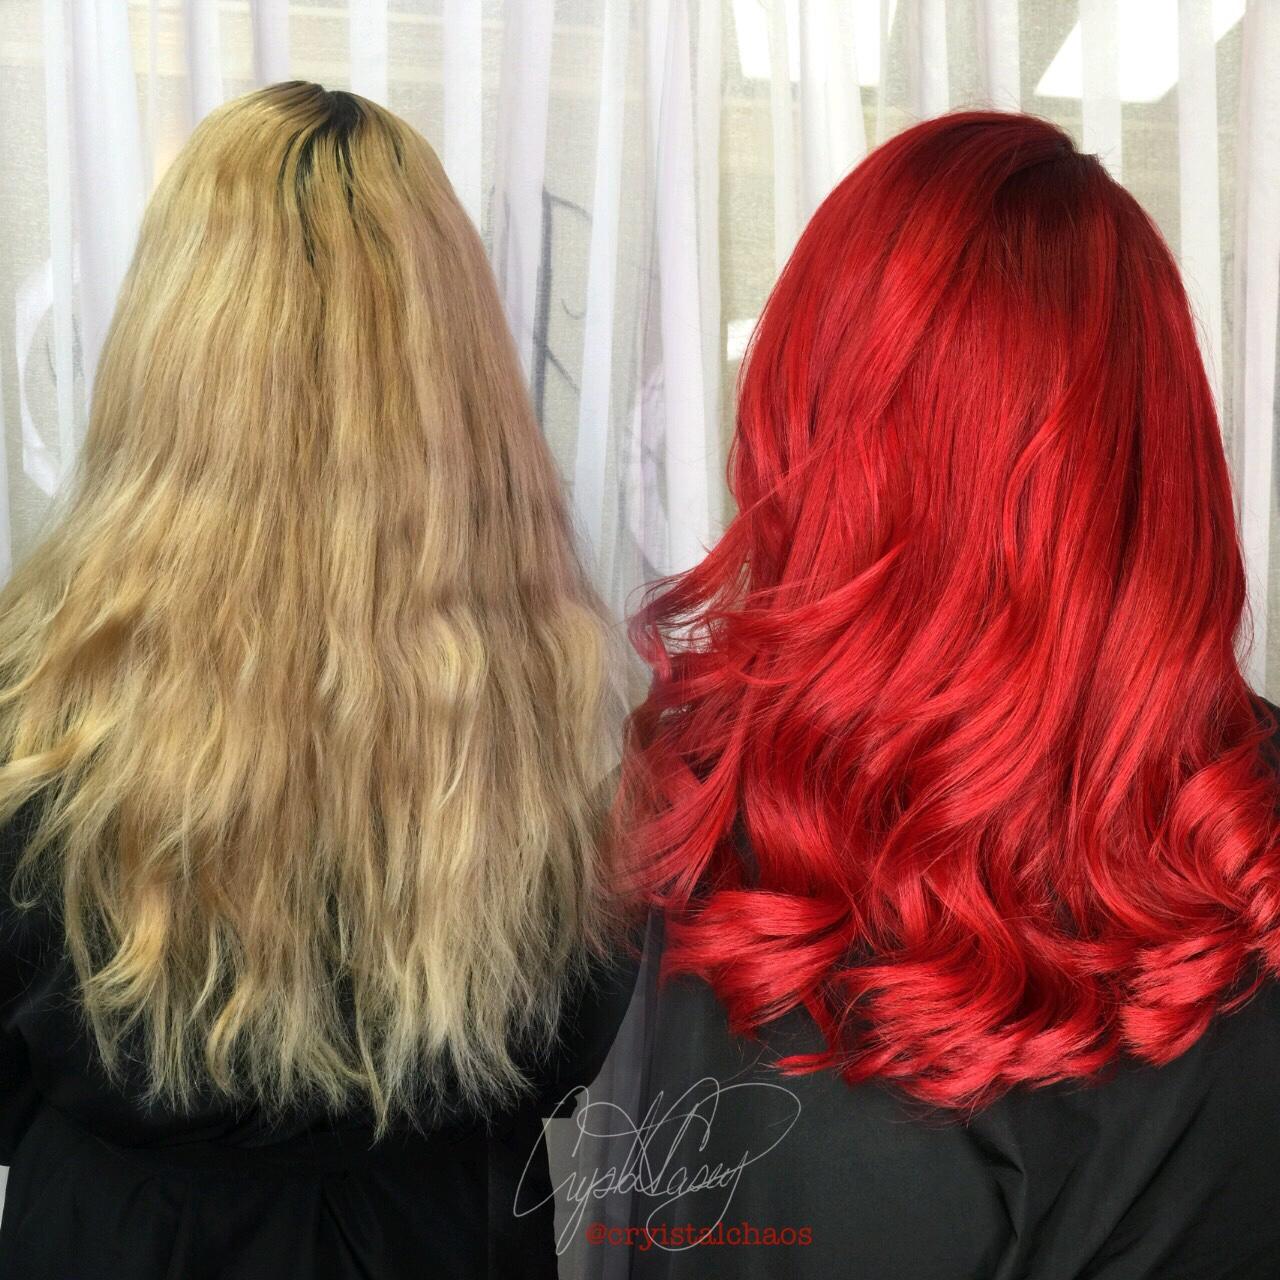 TRANSFORMATION: Pretty Blonde To HIGH VOLTAGE Red